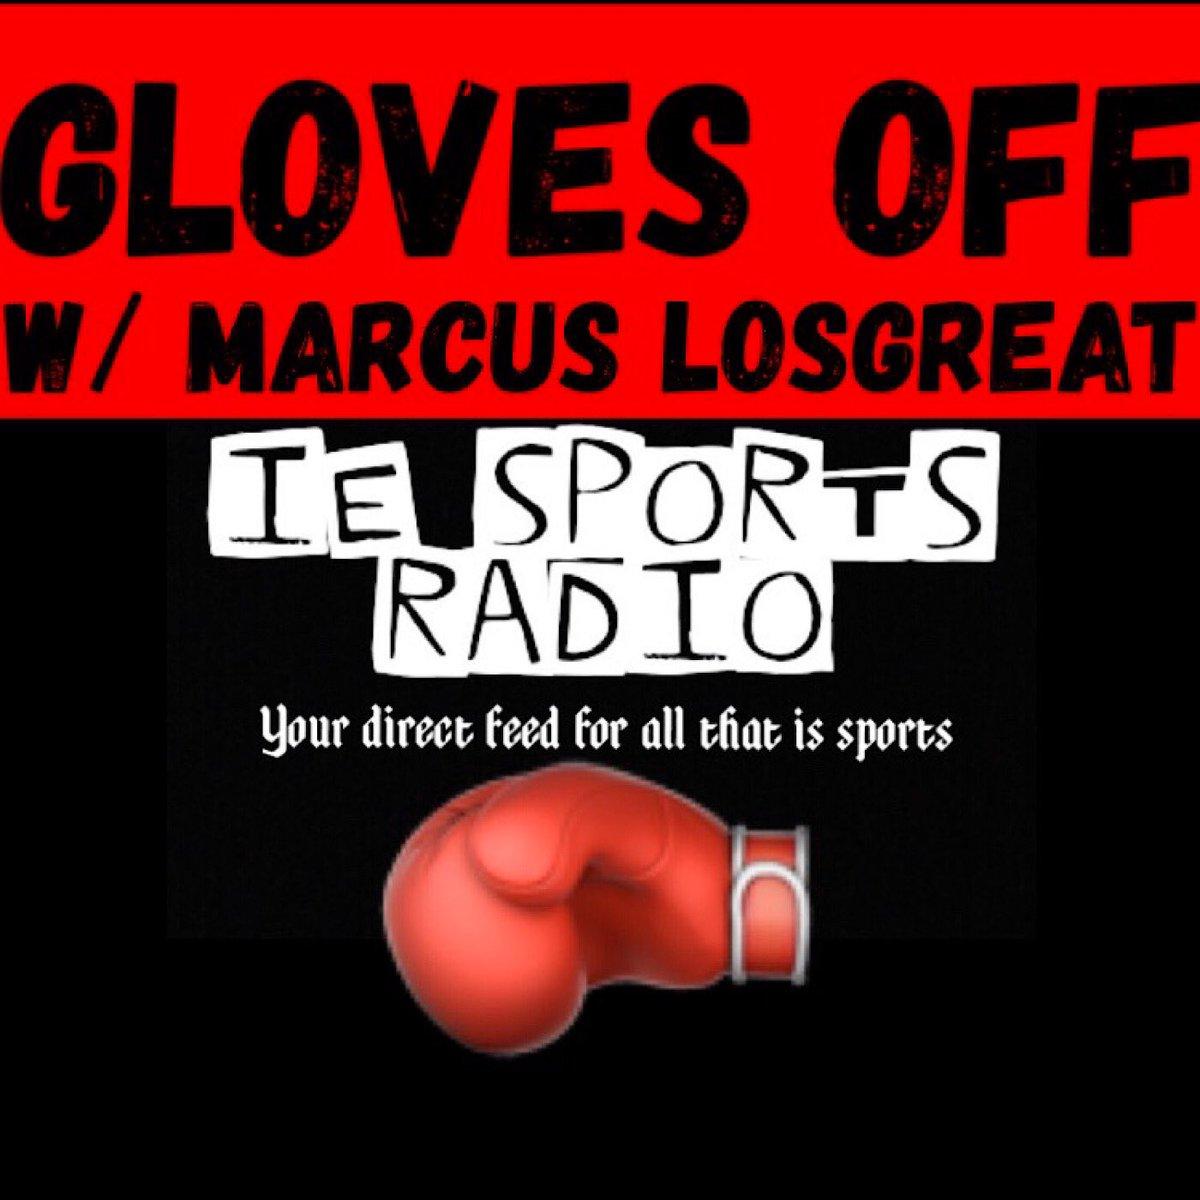 Next Up: TUE 2/18 5pm PST/8pm EST #GlovesOff with @MLosgreat #WilderFury2 #Boxing #MMATwitter #UFCFightNight167 #ShowtimeBoxing #ShoBox #GarciaFonseca #PlantFeigenbutz #DAZNUSA #PBC #GlovesOffBoxing #Boxeo #PremierBoxing